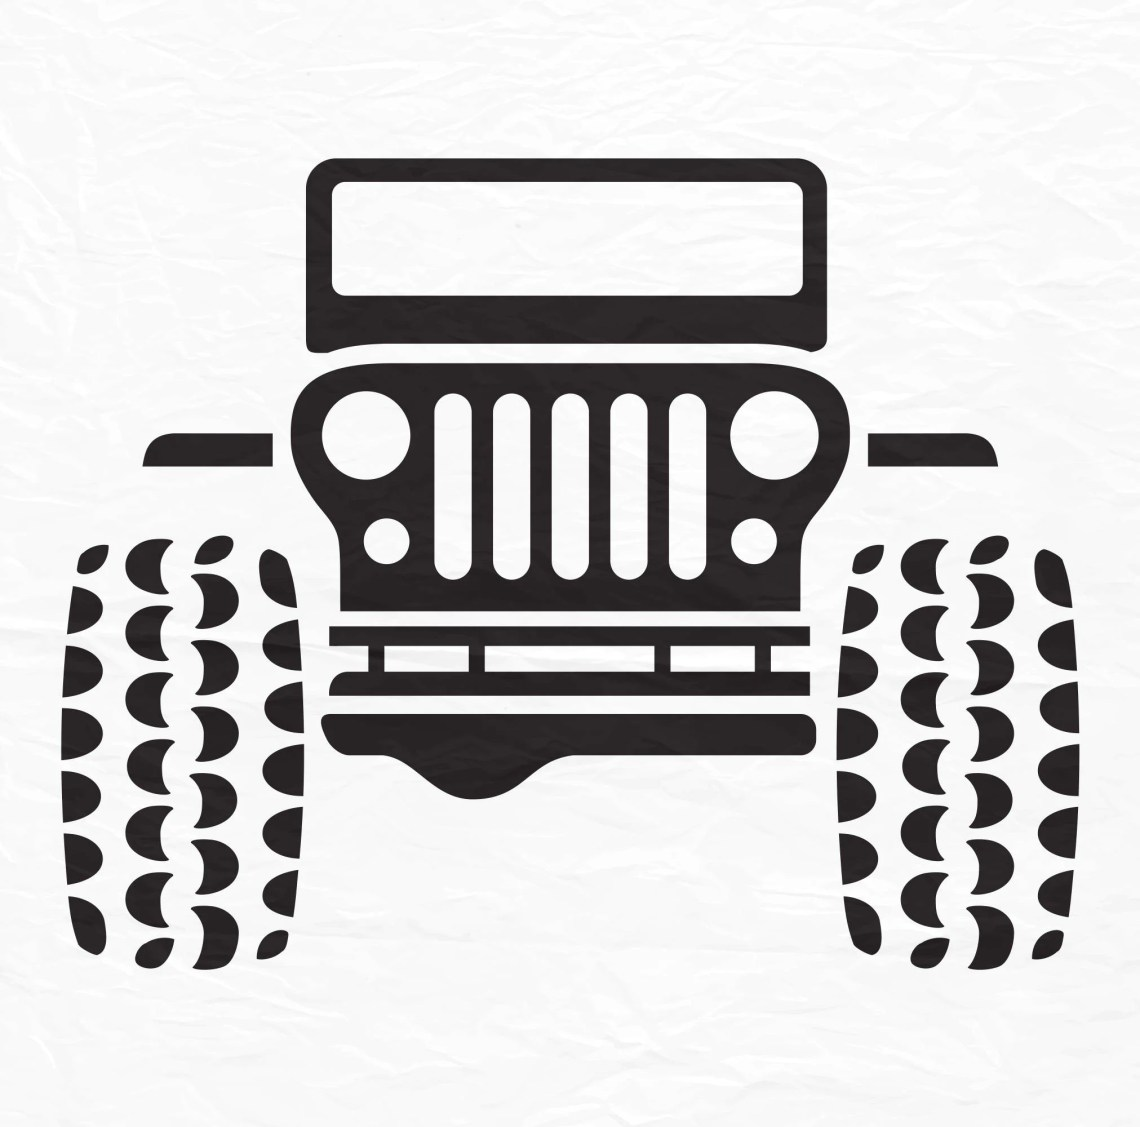 Download Jeep SVG Jeep Jeep 4x4 Quote Svg SVG Files Cricut Cut